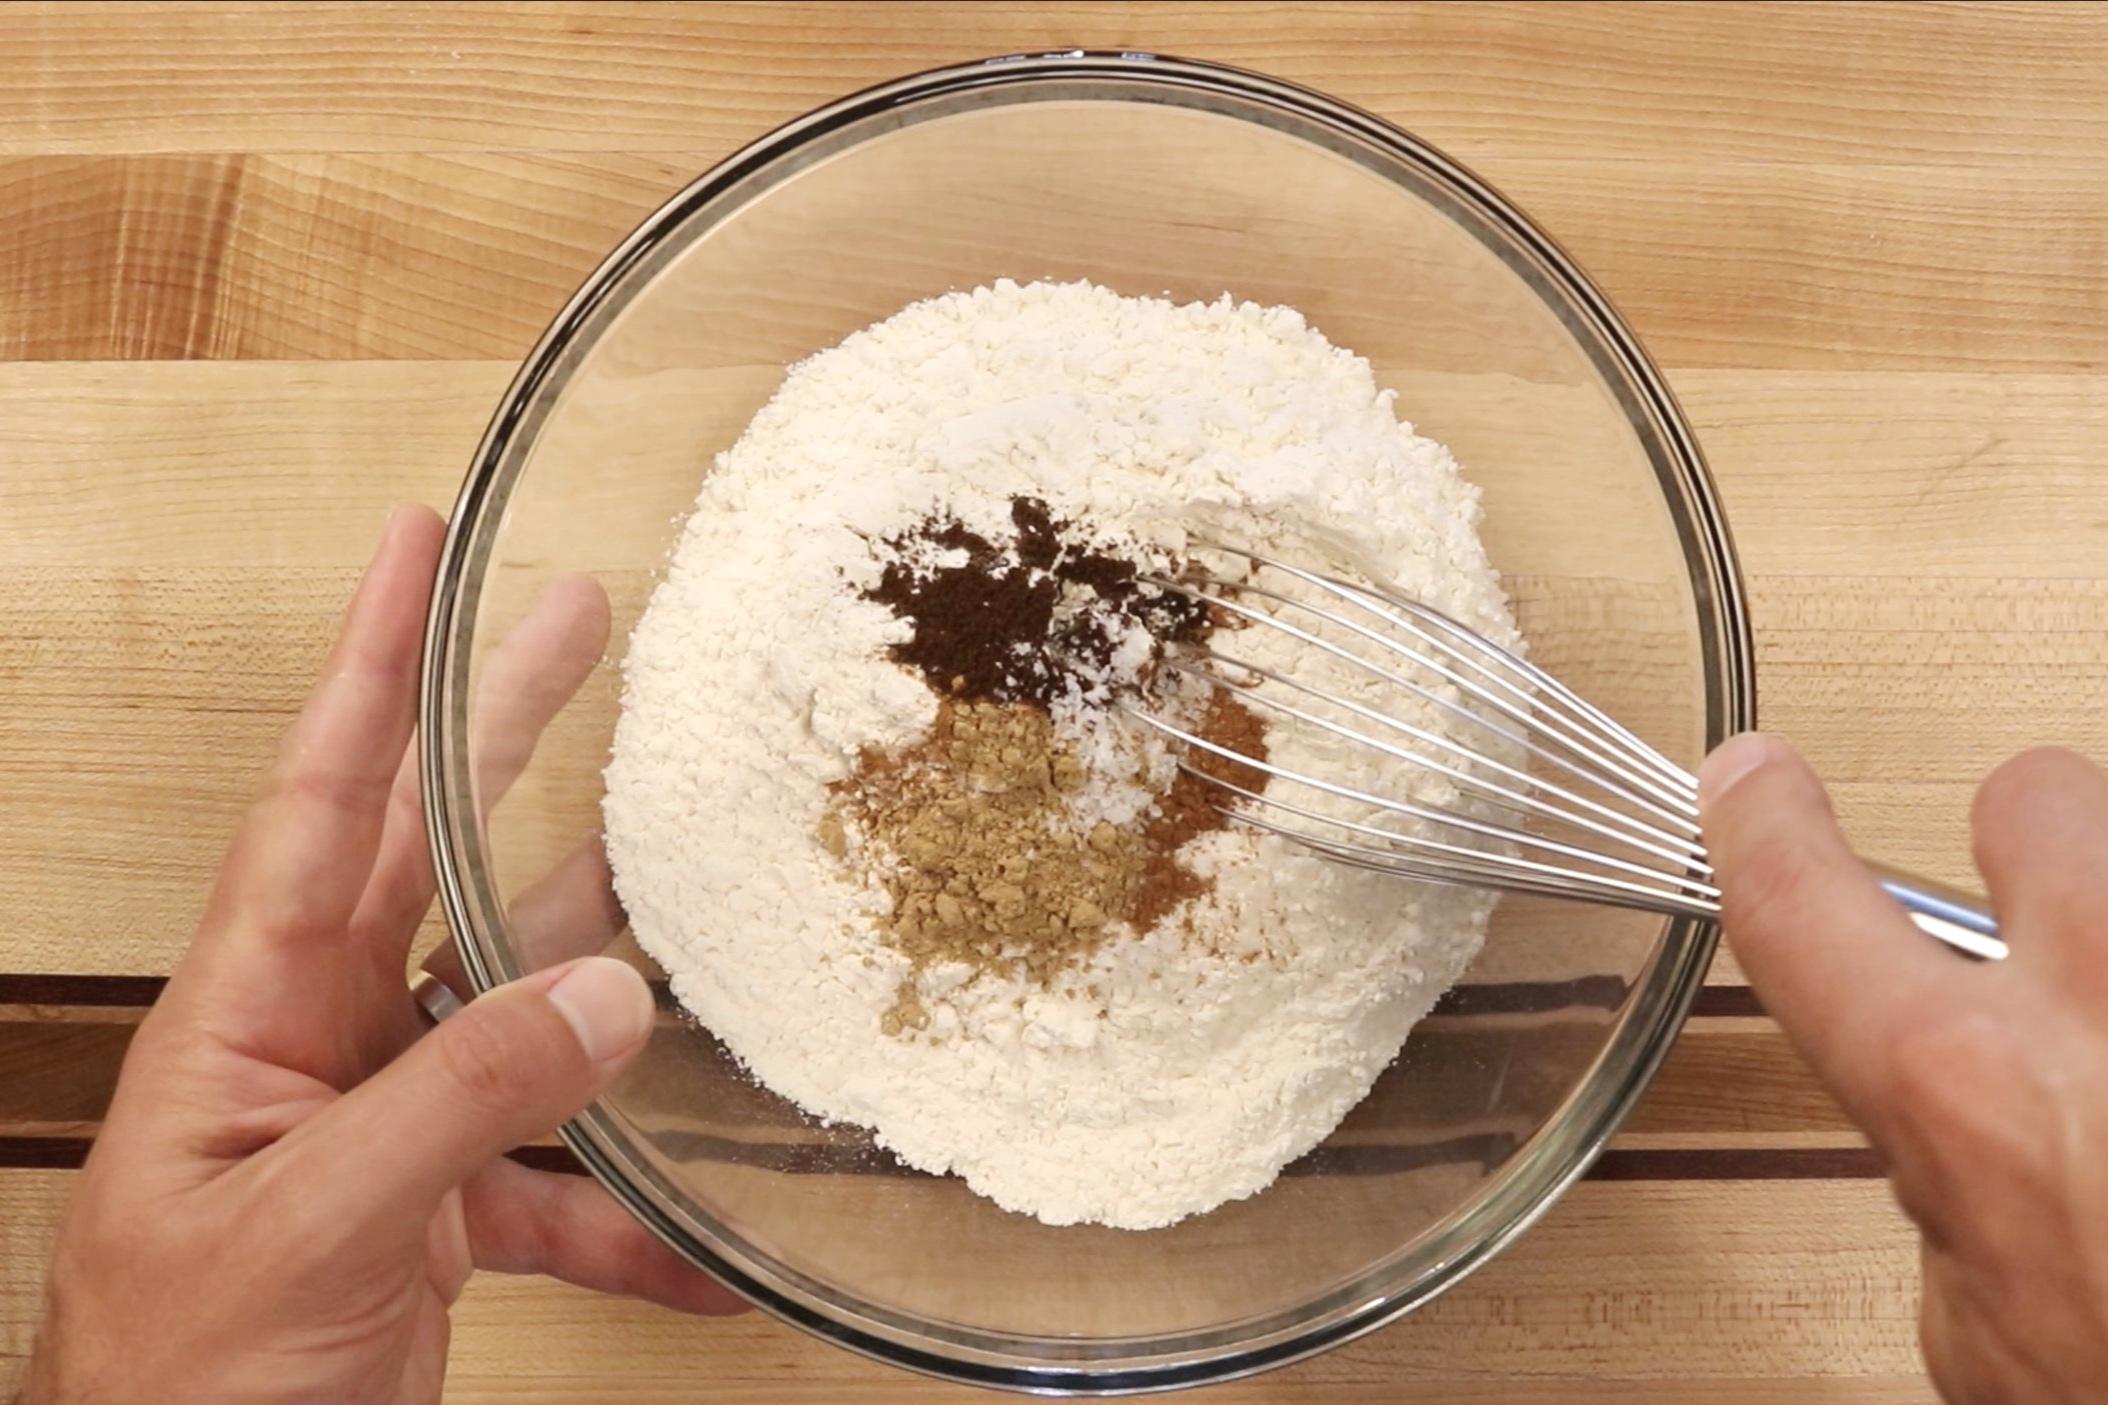 1. In a medium bowl, whisk together flour, baking soda, cinnamon, ginger, clove and salt. Set aside. -